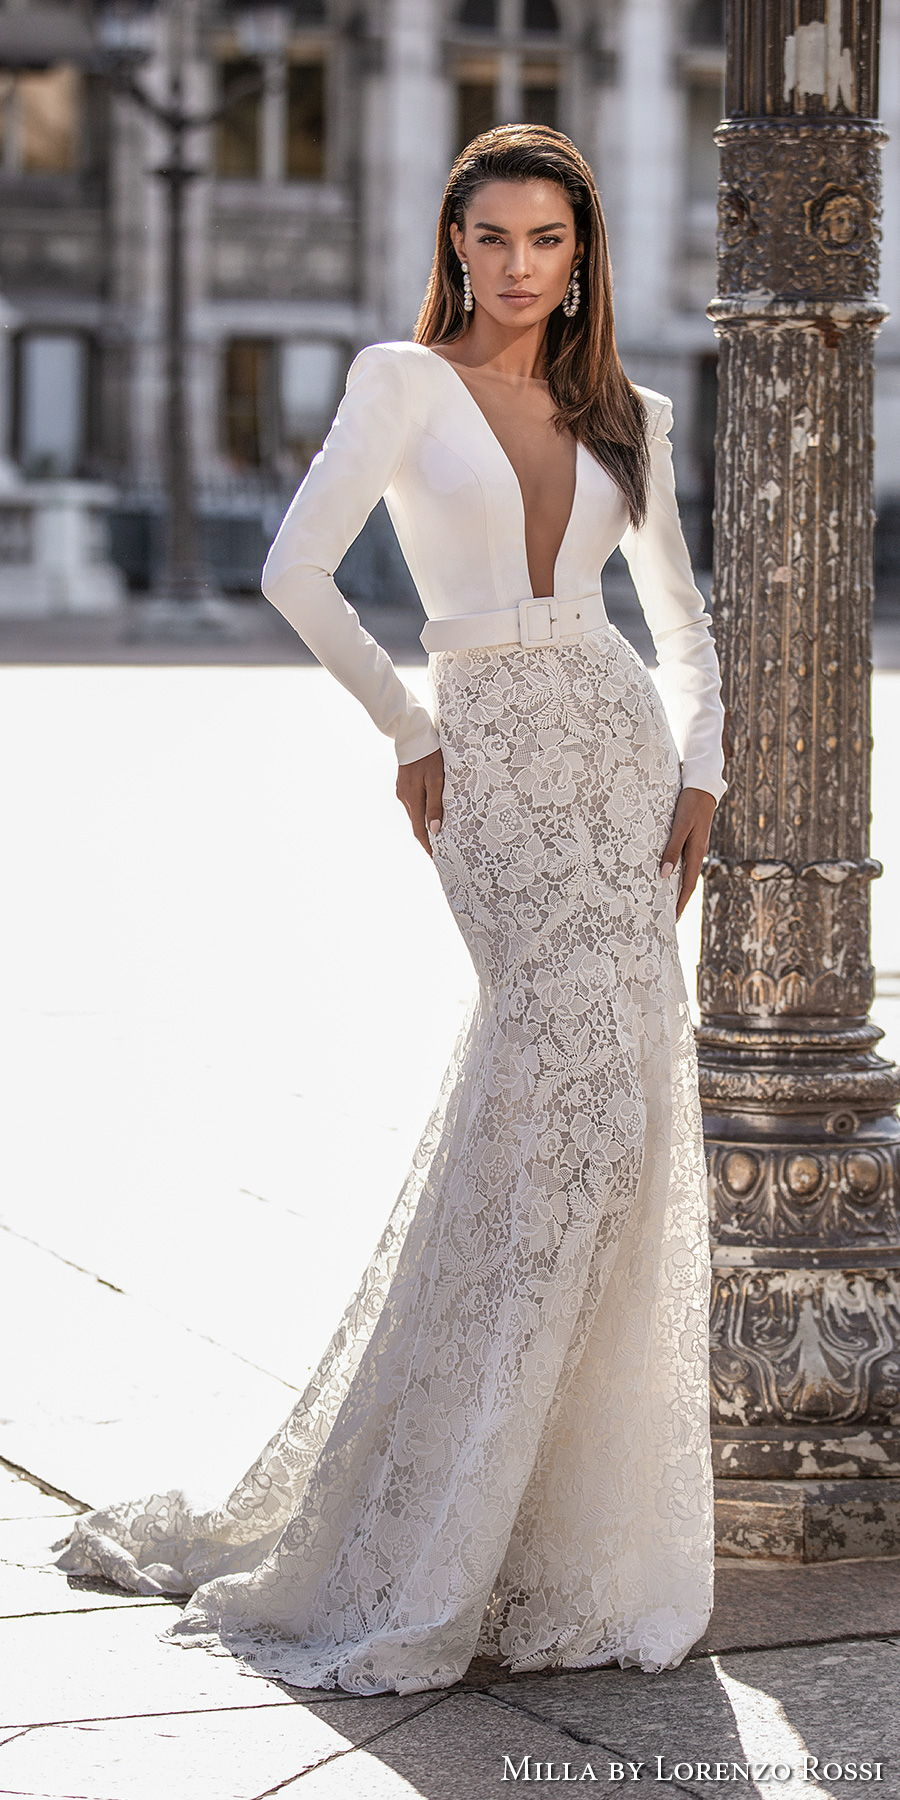 milla lorenzo rossi 2021 bridal long sleeves deep plunging v neck minimalist bodice lace skirt chic modern mermaid sheath wedding dress sheer button back sweep train (rochelle) mv